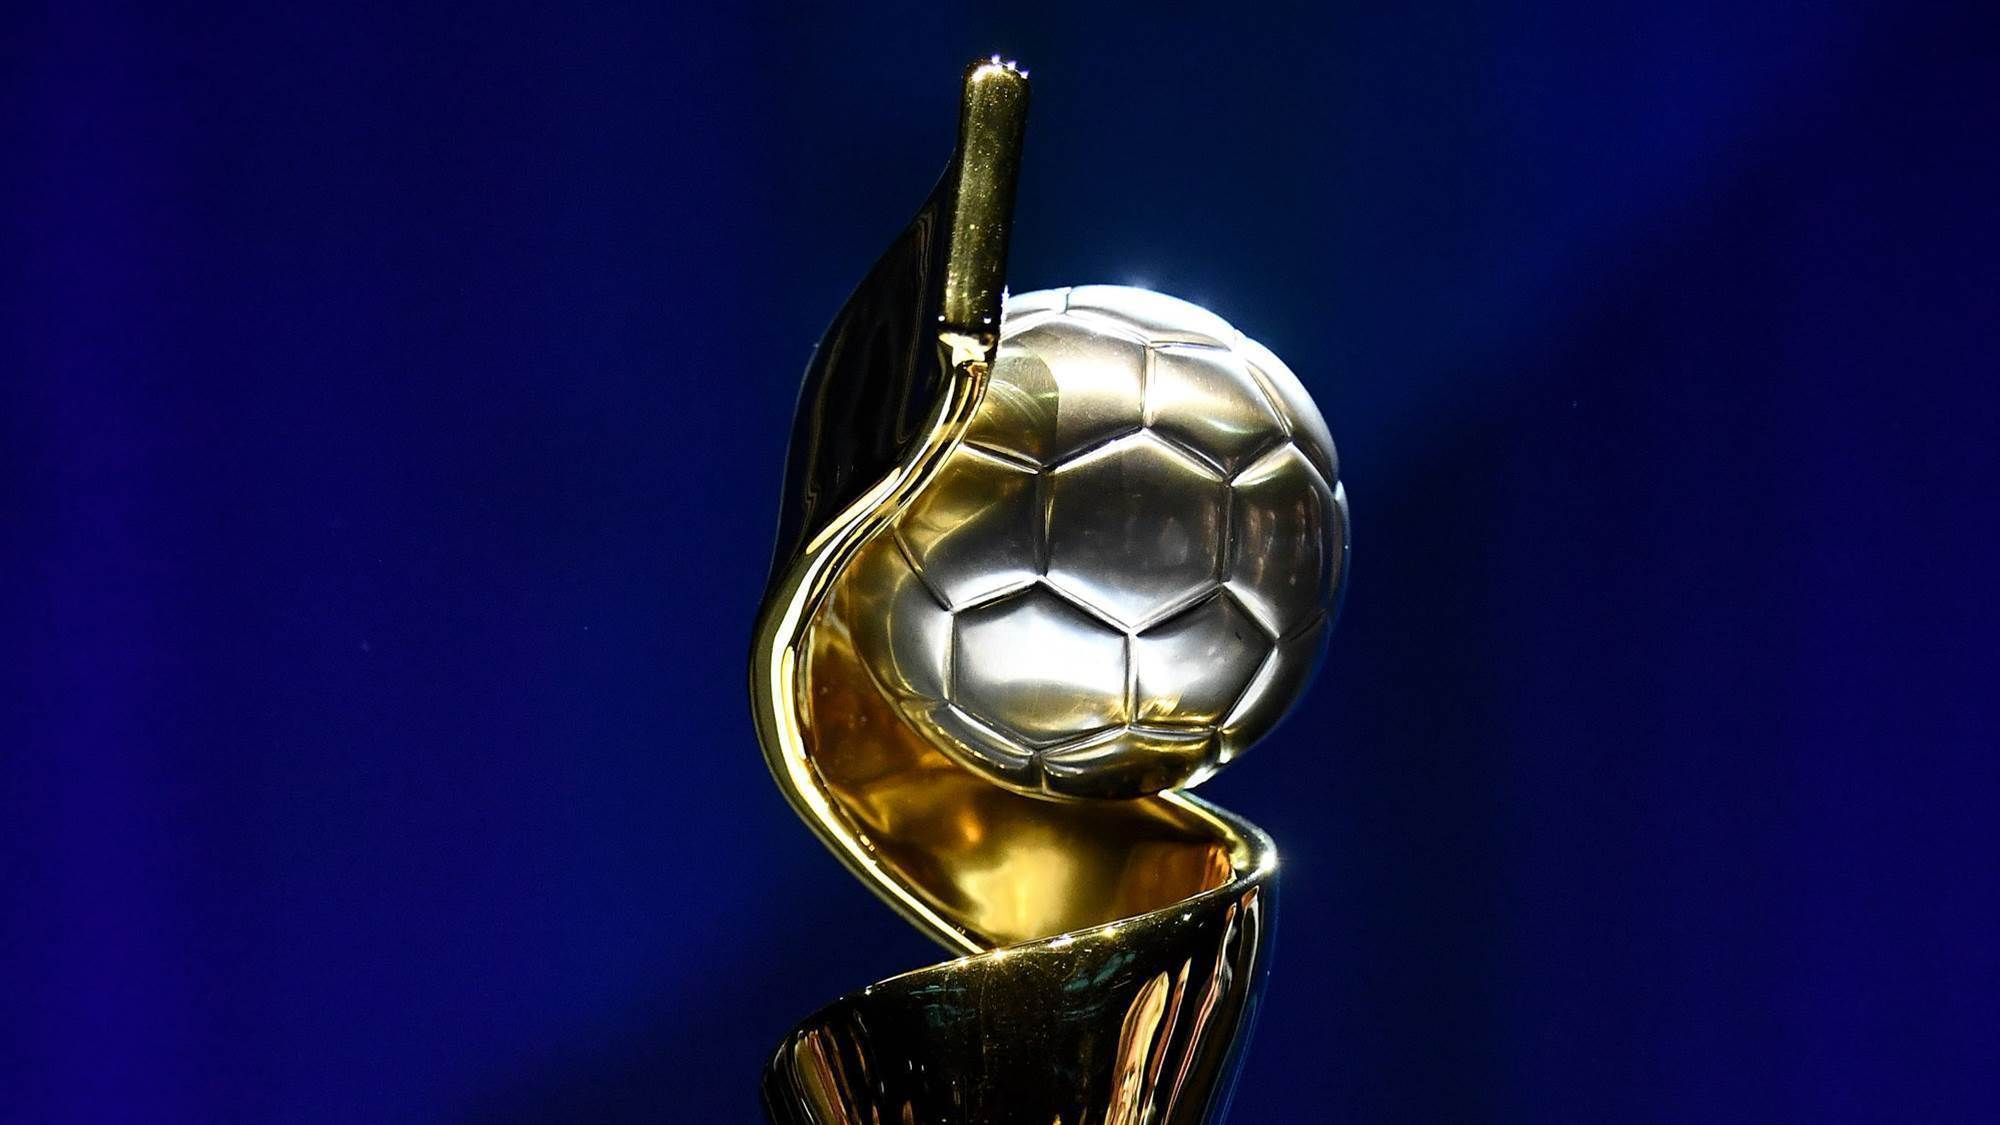 World Cup trophy to hit Australian soil